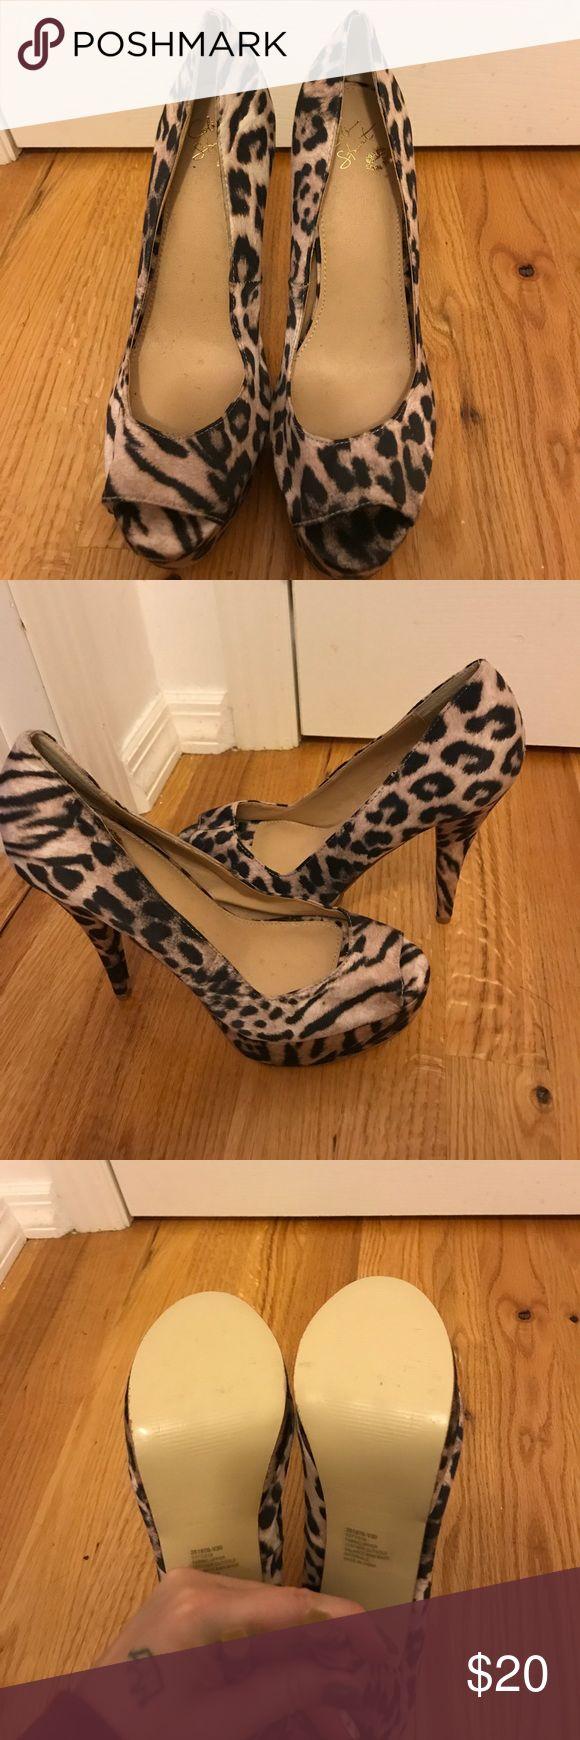 Colin Stewart Cheetah Heels Never worn Colin Stewart Cheetah Heels SZ 9 Colin Stuart Shoes Heels